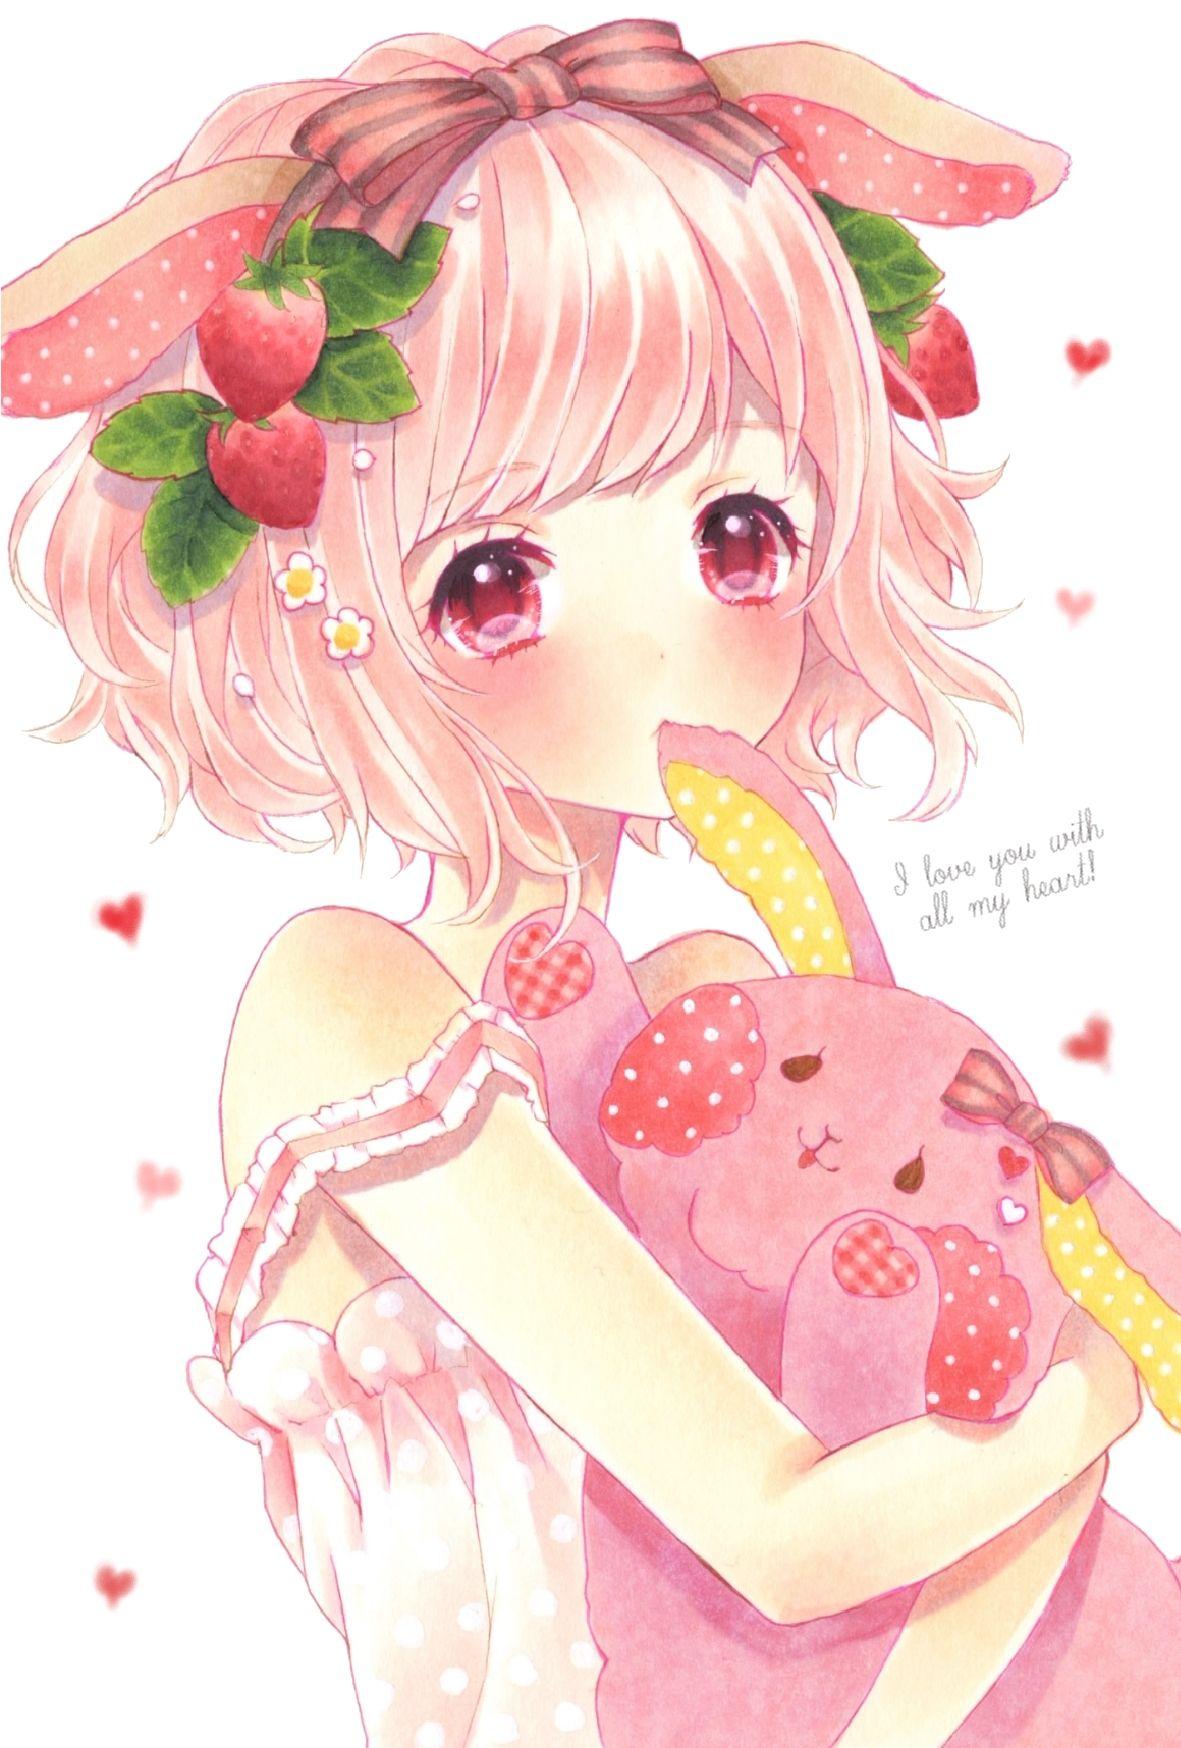 anything anime おしゃれまとめの人気アイデア pinterest mia nangano アニメチビ アニメ少年 アニメ の描き方